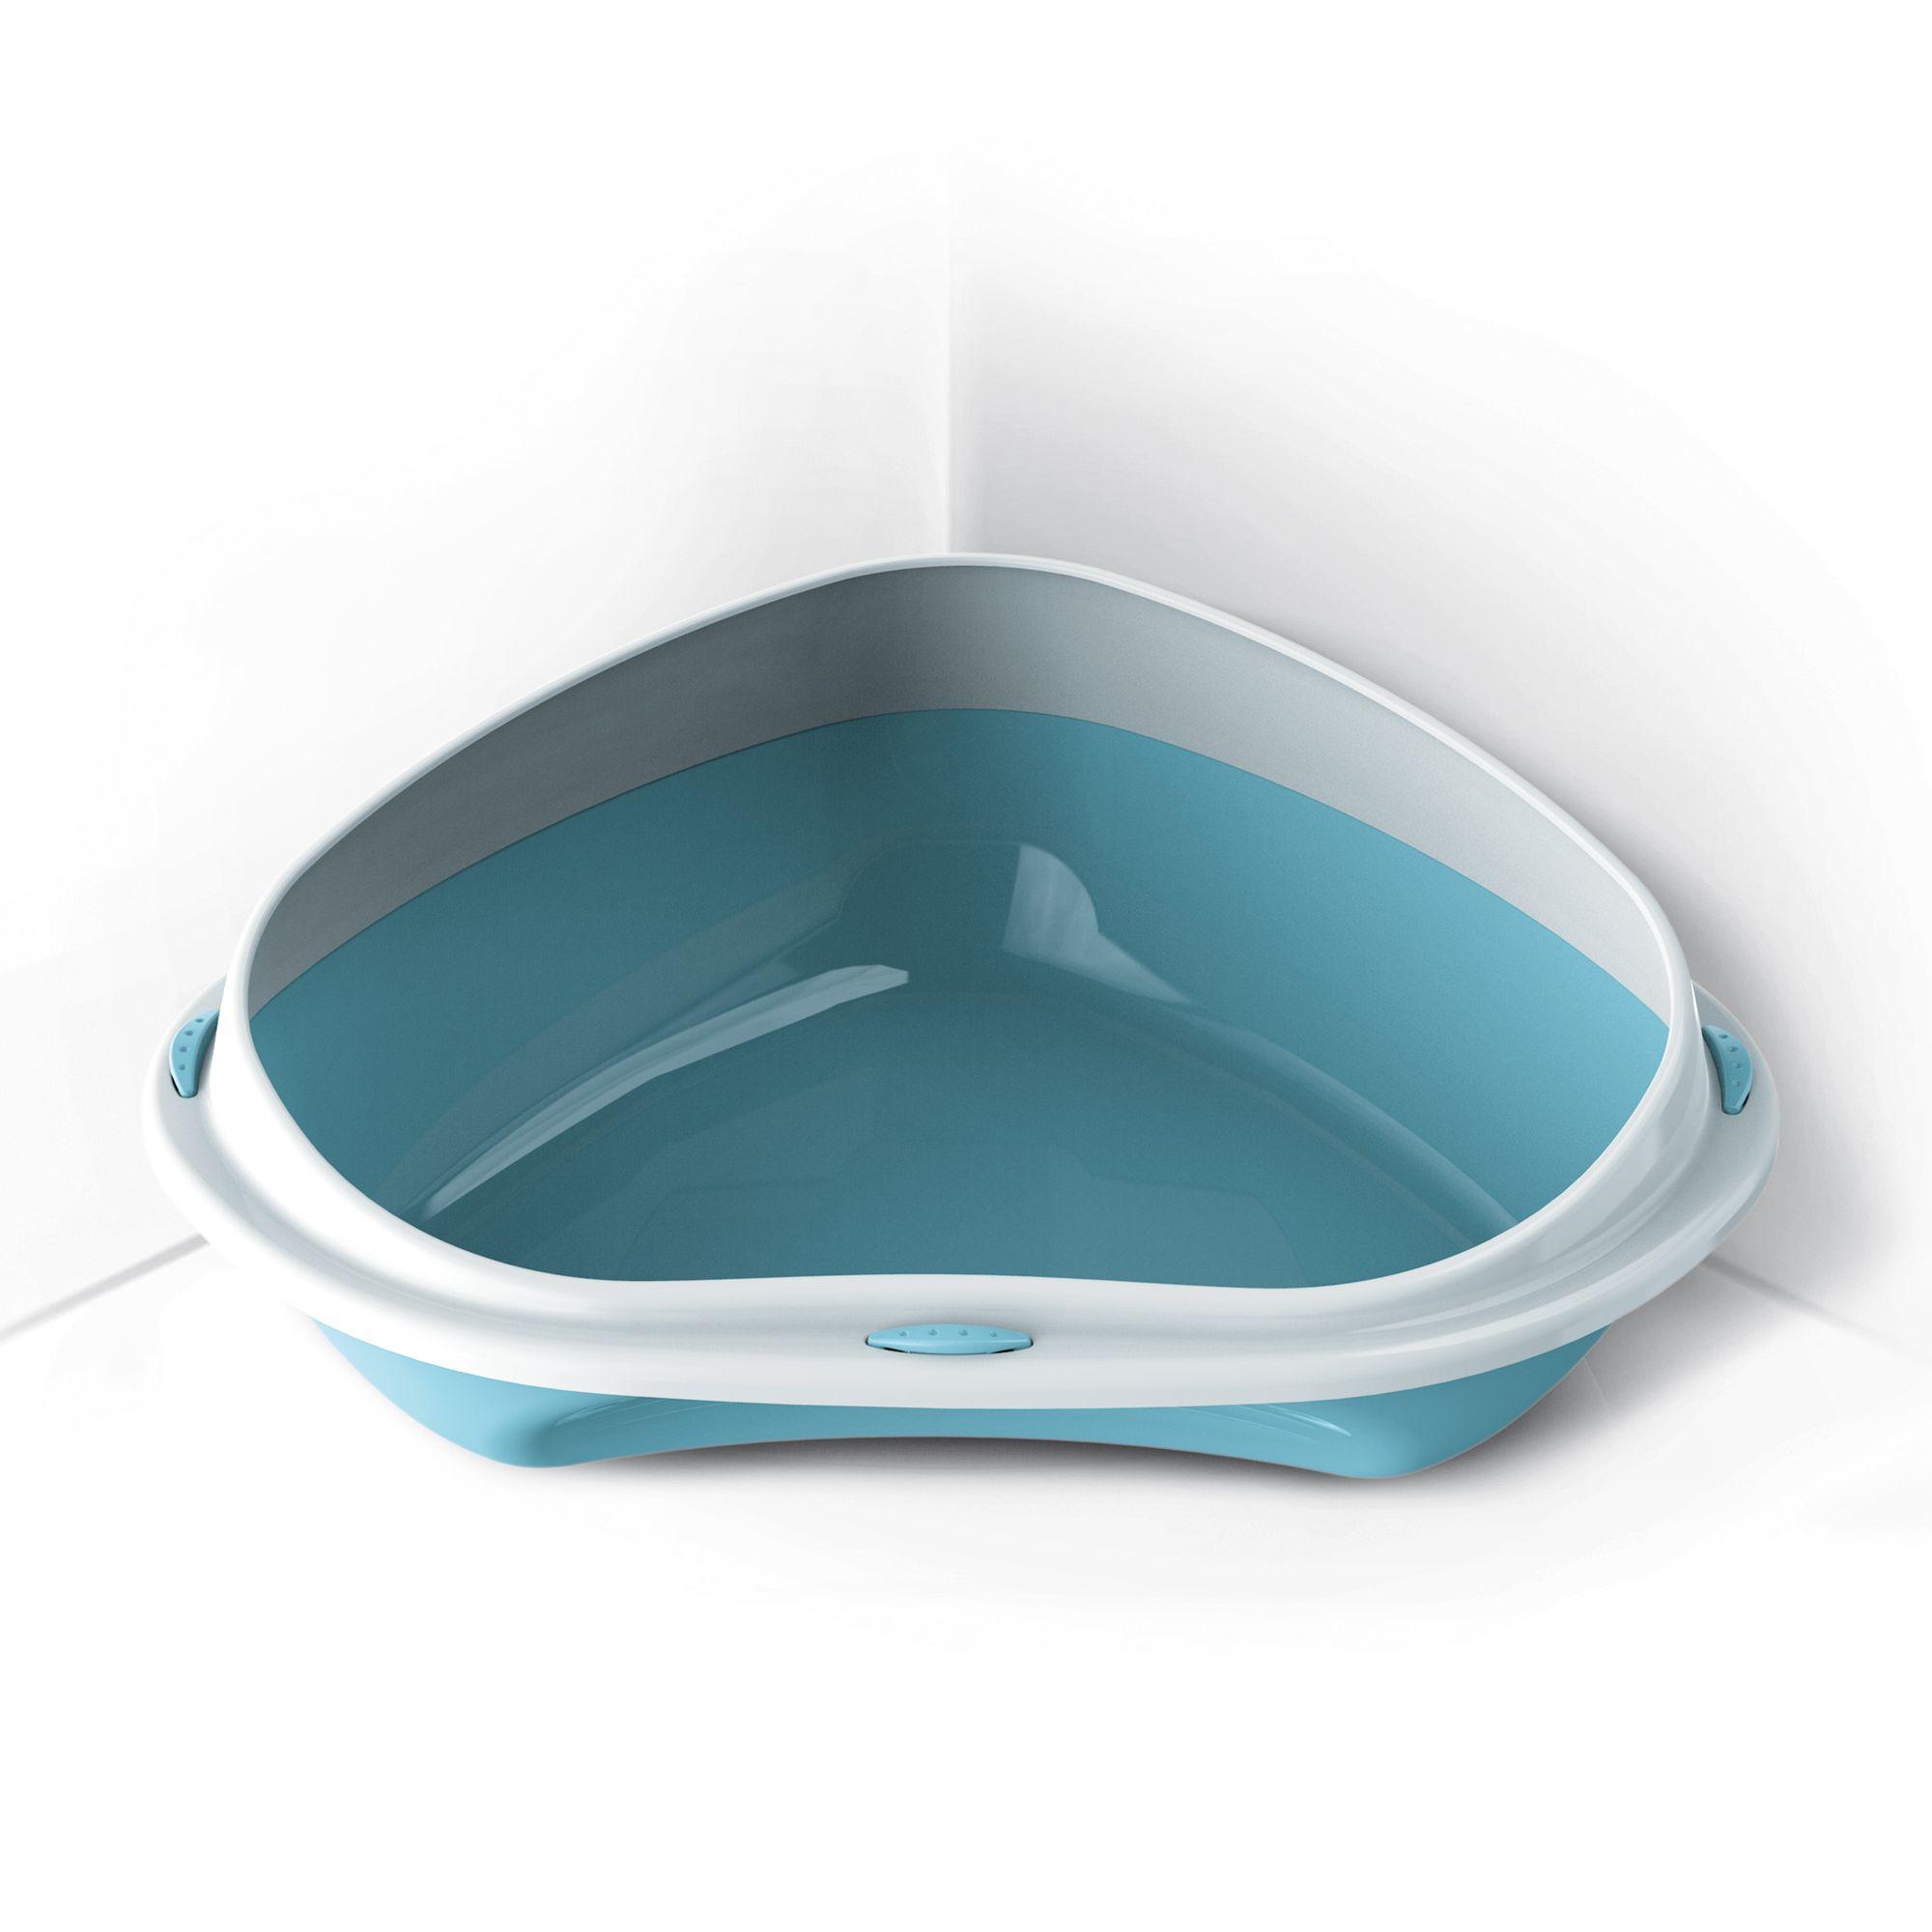 Rohová toaleta s vysokým okrajem Argi - modrá - 58 x 48 x 20,5